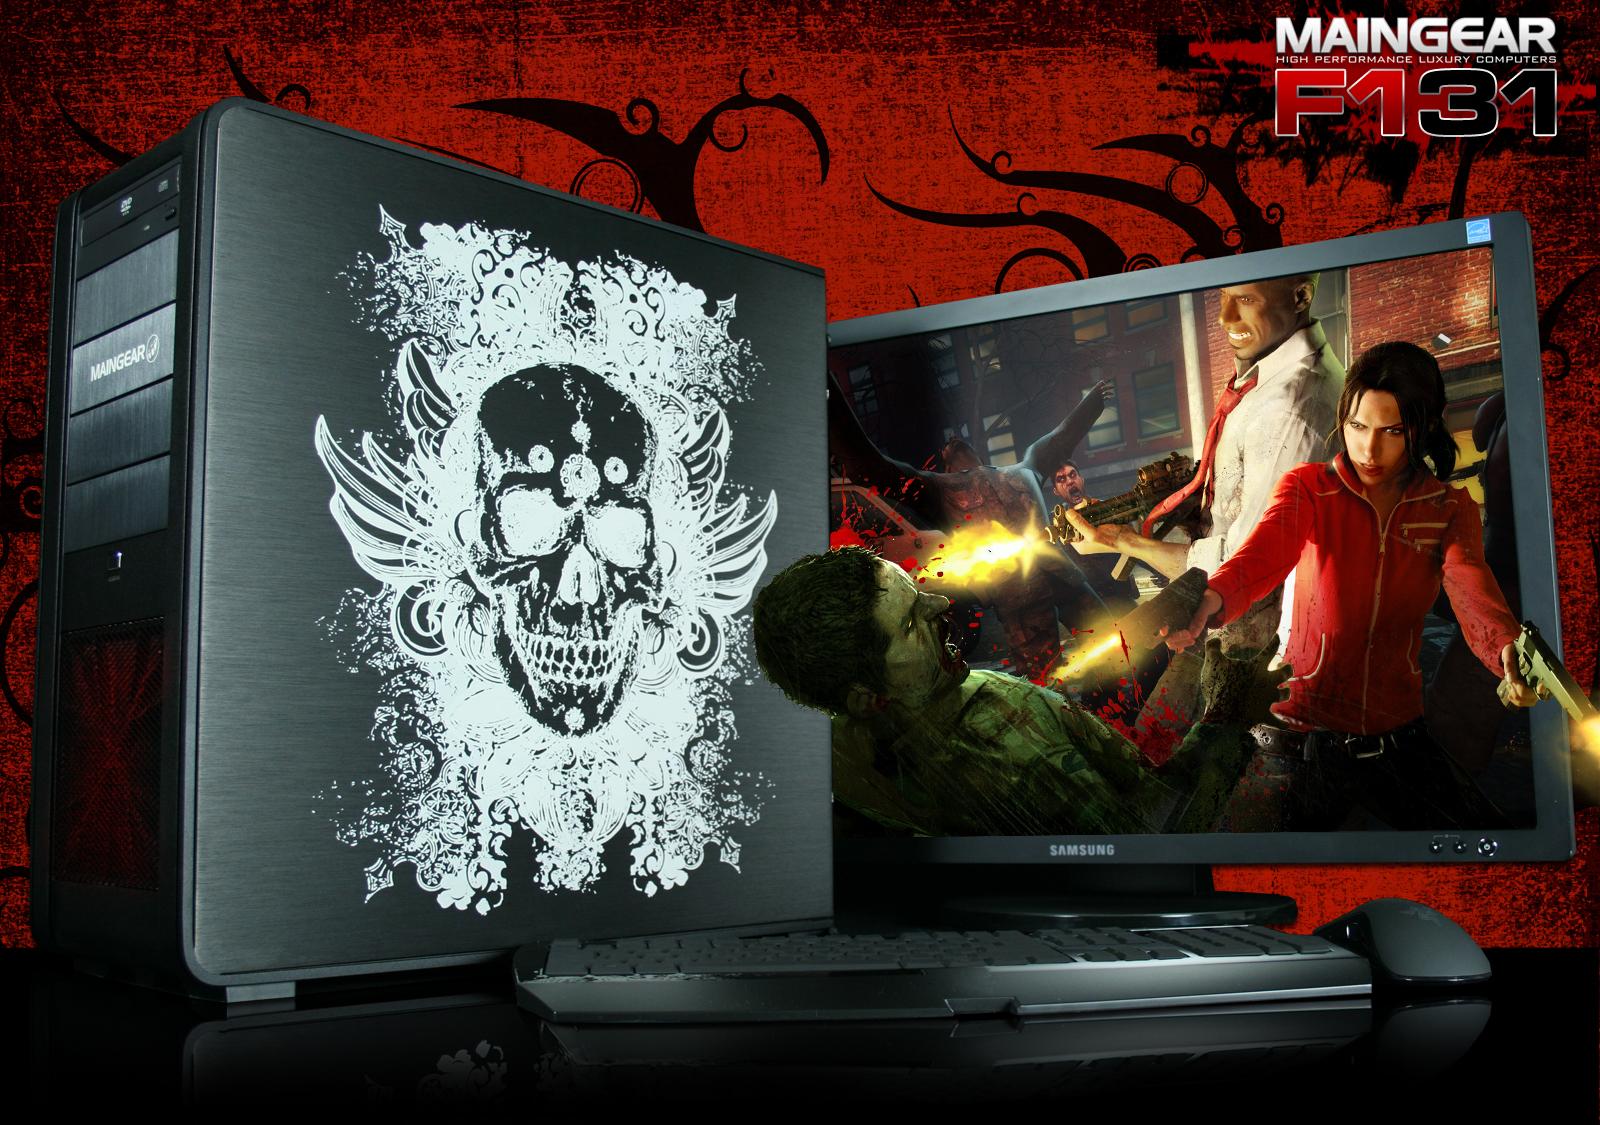 MAINGEAR F131 gaming PC makes a comeback